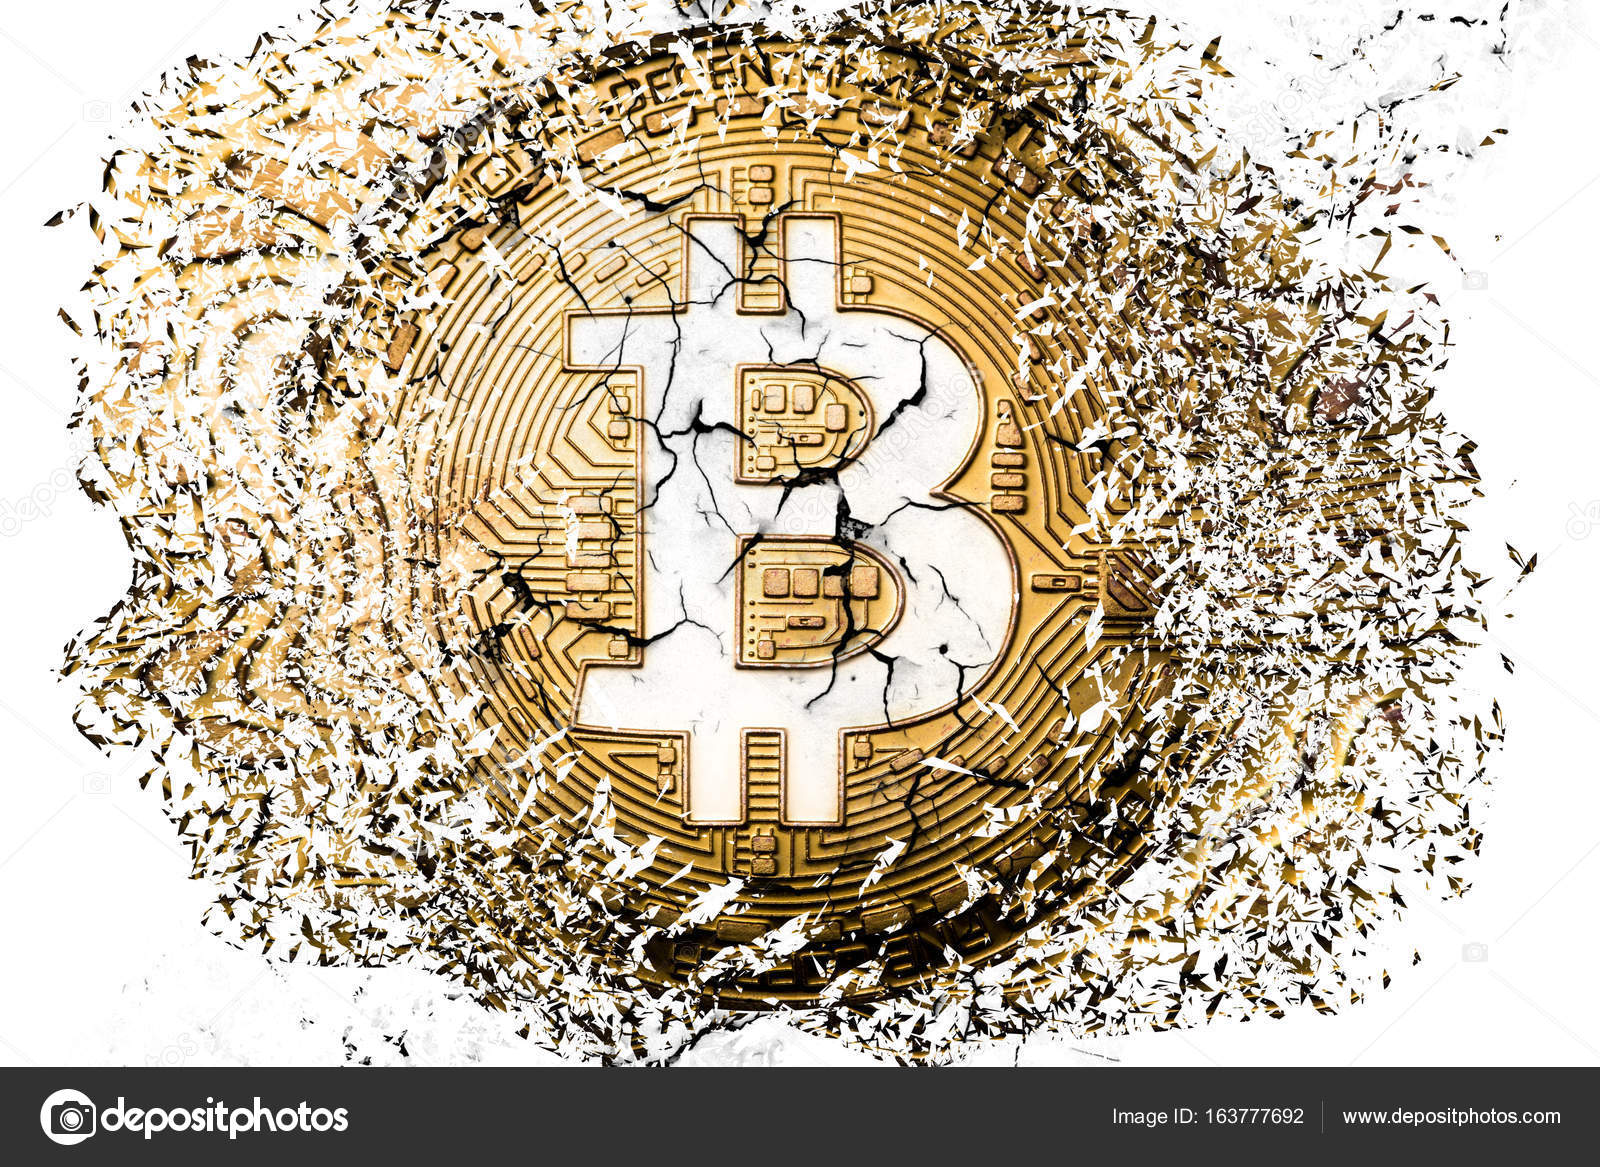 Bitcoin symbol explosion stock editorial photo primakov 163777692 bitcoin explosion and disintegration photo by primakov buycottarizona